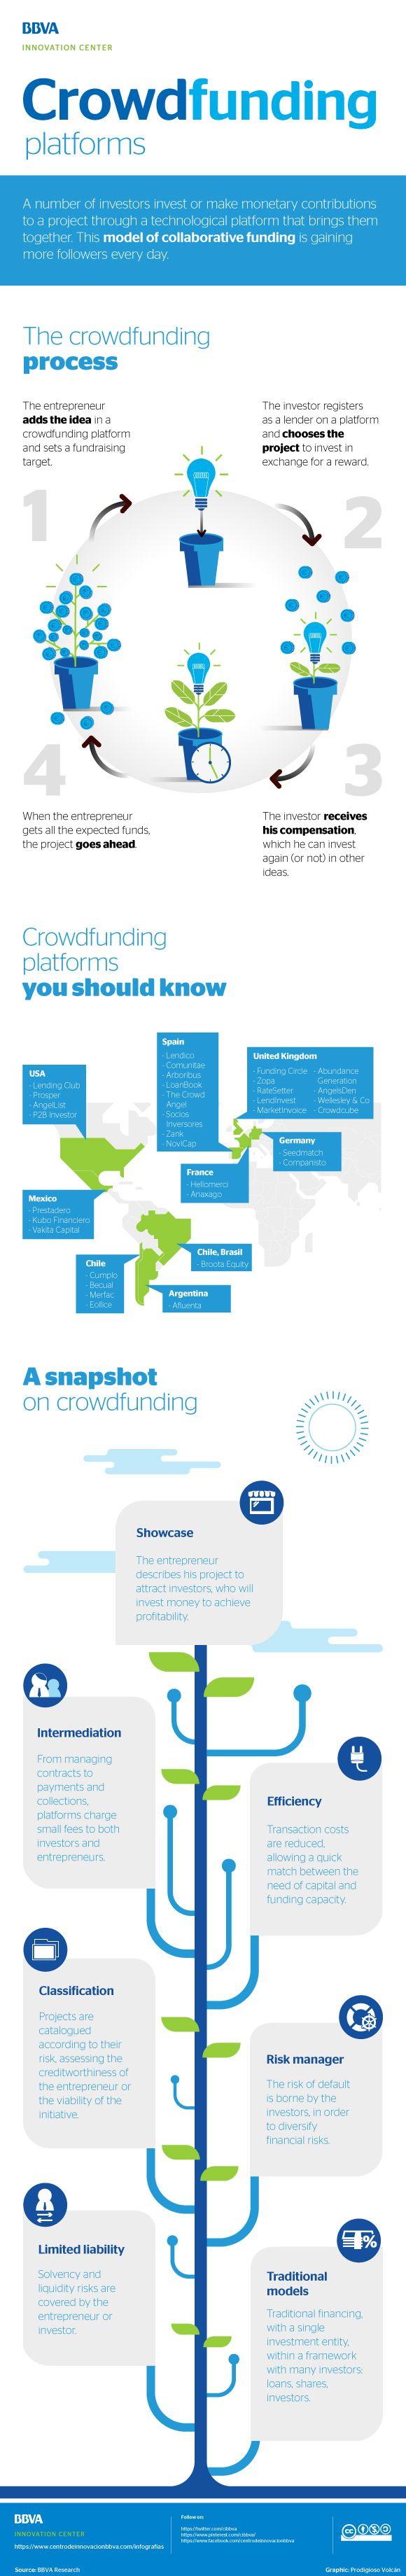 Infographic: Crowdfunding platforms - BBVA Innovation Center